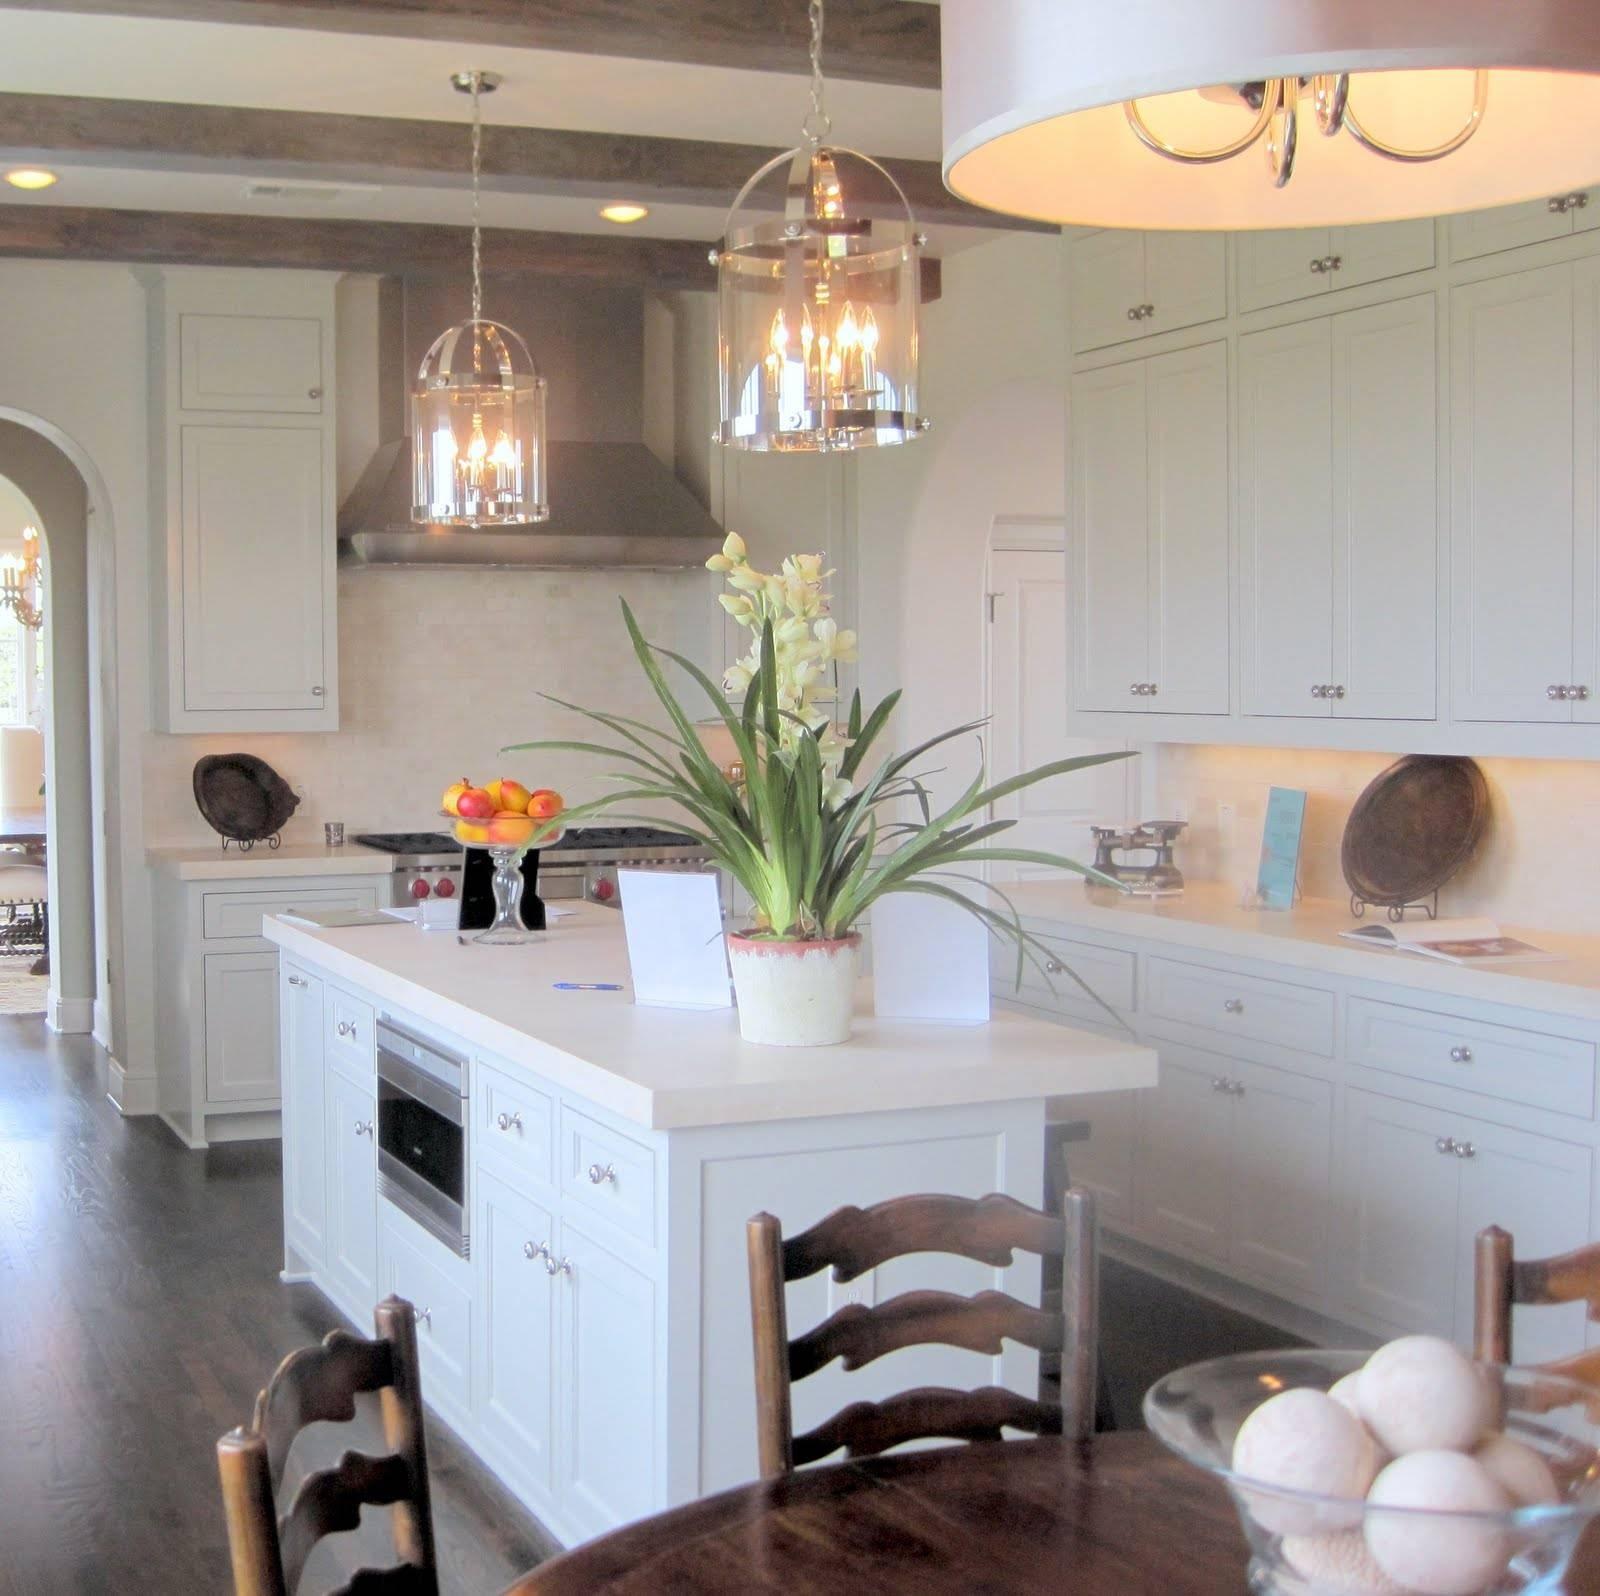 Kitchen Pendant Light Fixture | Homesfeed regarding Double Pendant Lights For Kitchen (Image 12 of 15)